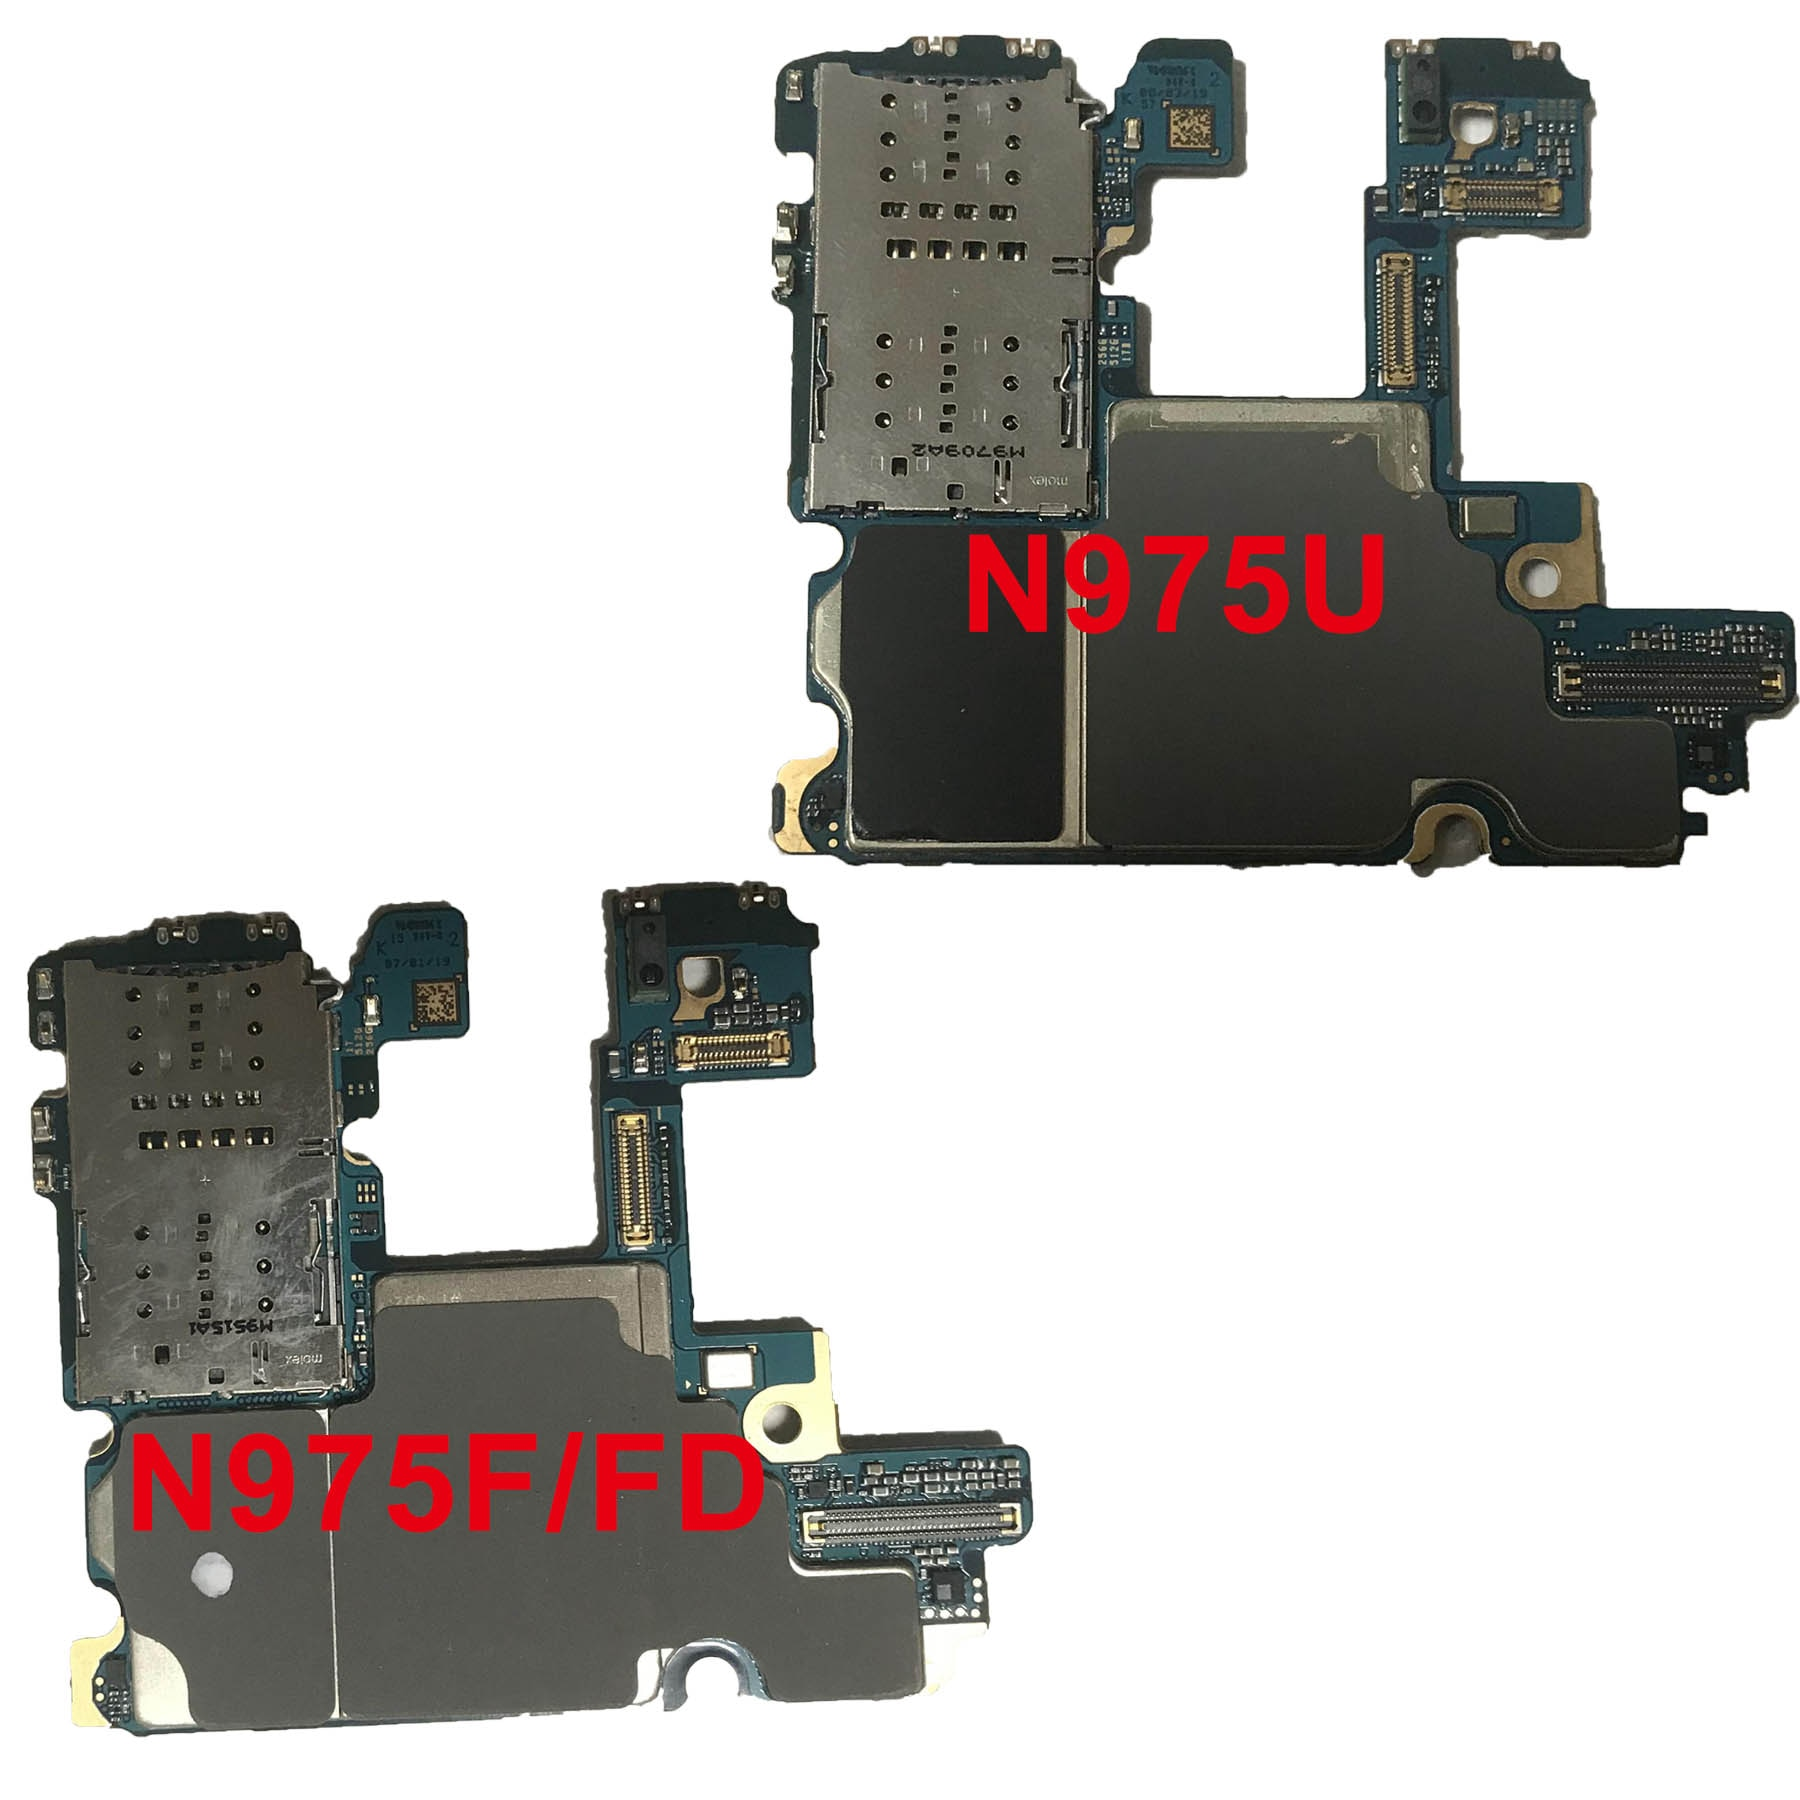 Original Motherboard For Samsung Galaxy Note 10 Plus N975F N975U N976B 5G N970U N970F 256G 512G Dual Sim Logic Board Unlocked enlarge